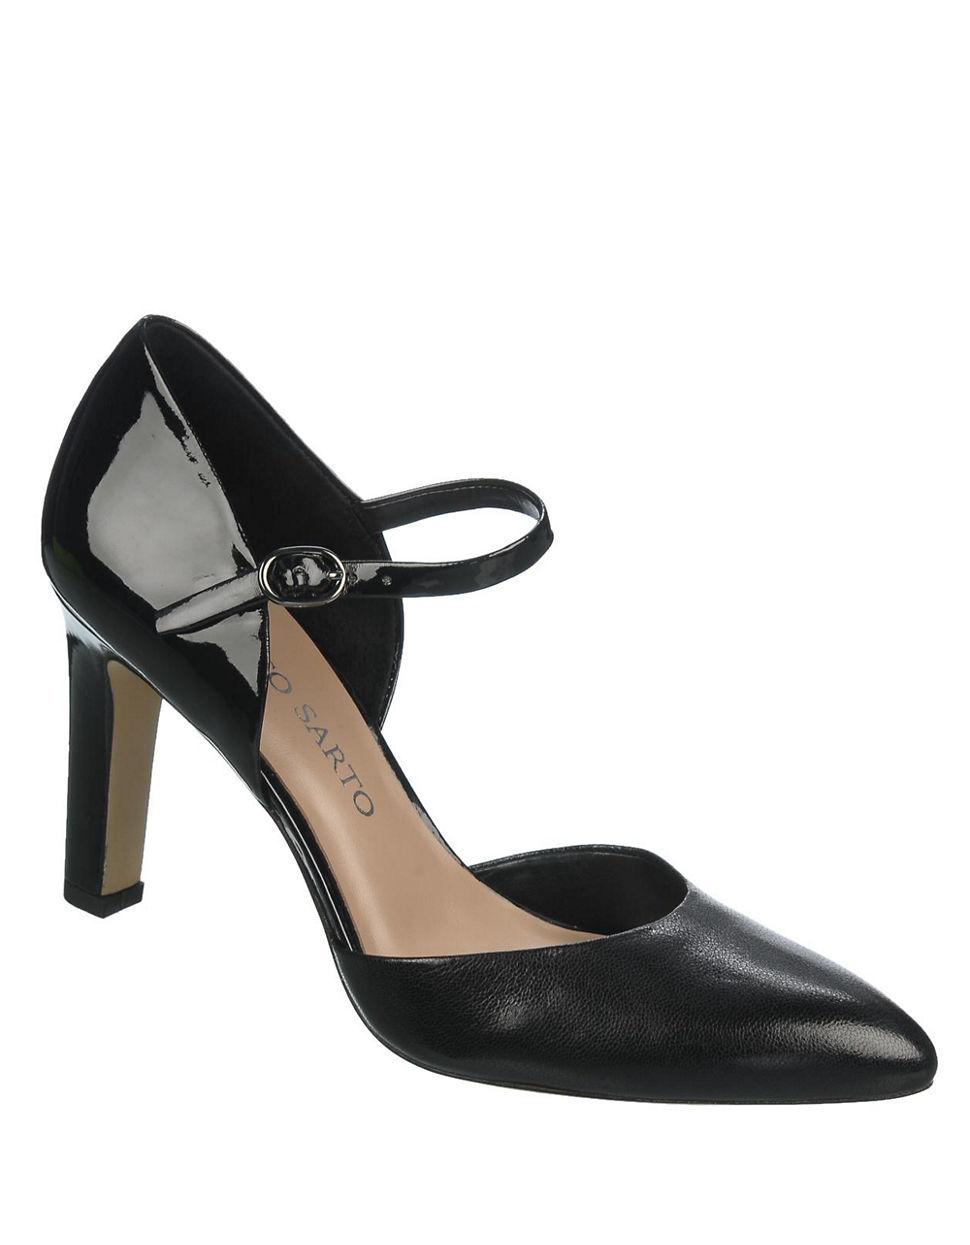 Franco Sarto Black Patent Leather Shoes